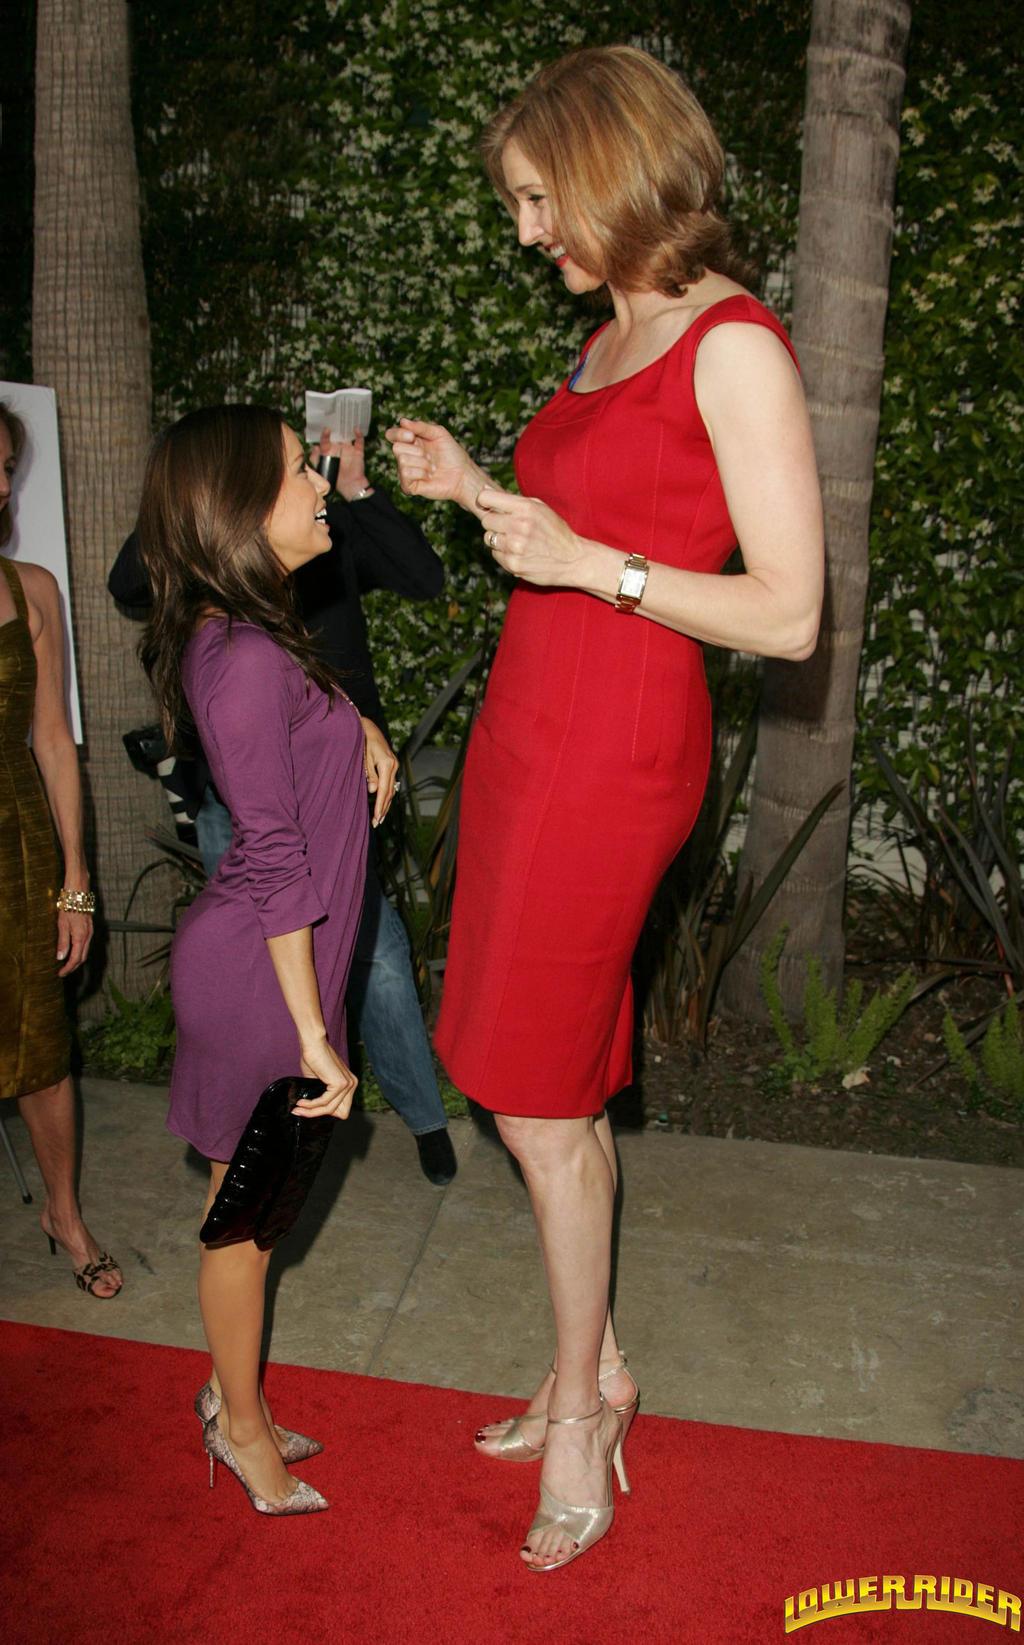 Amazon woman midget nackt gallery